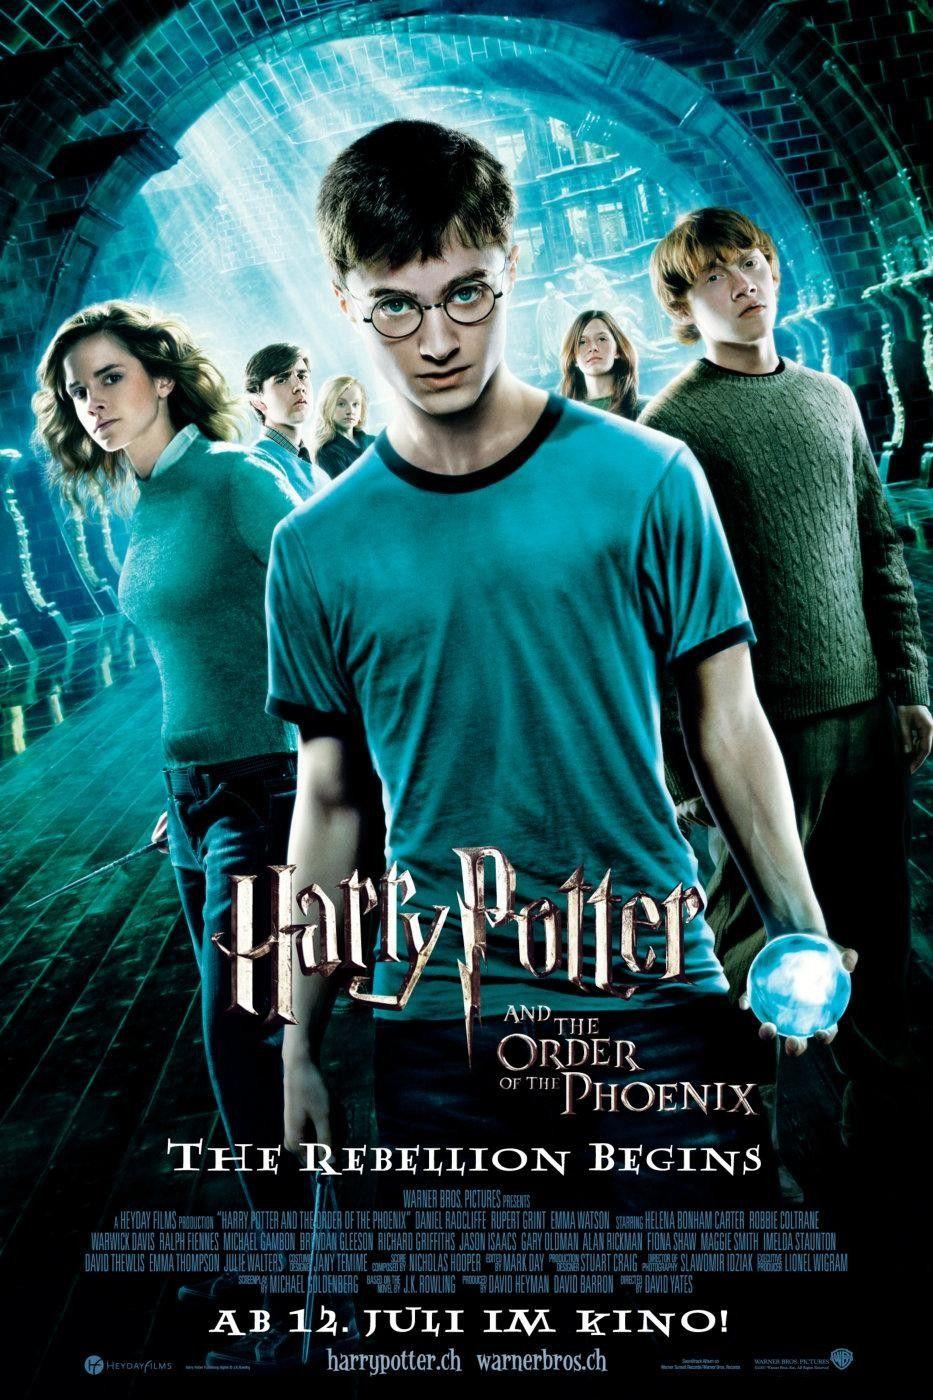 Pin By Carly Van Vuuren On Harry Potter Harry Potter Movie Posters Harry Potter Movies Daniel Radcliffe